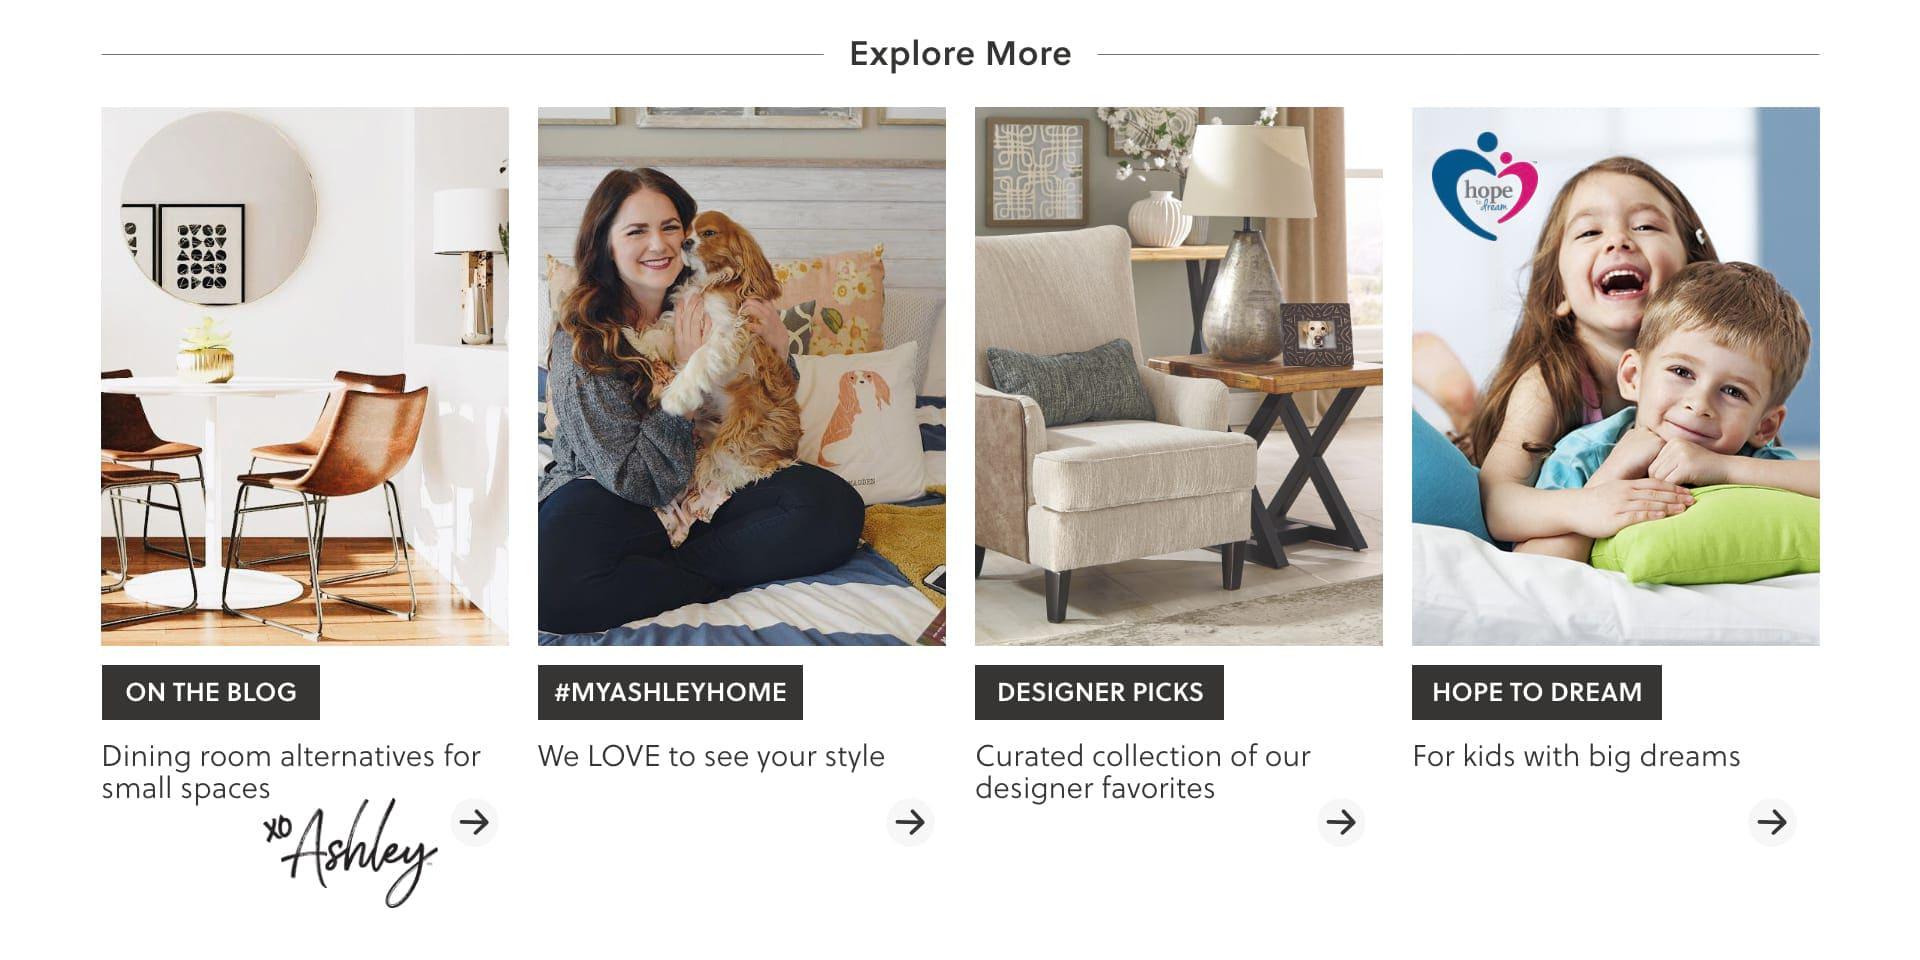 Ashley Furniture HomeStore Blog, Instagram My Ashley Home, Designer Picks, Hope to Dream